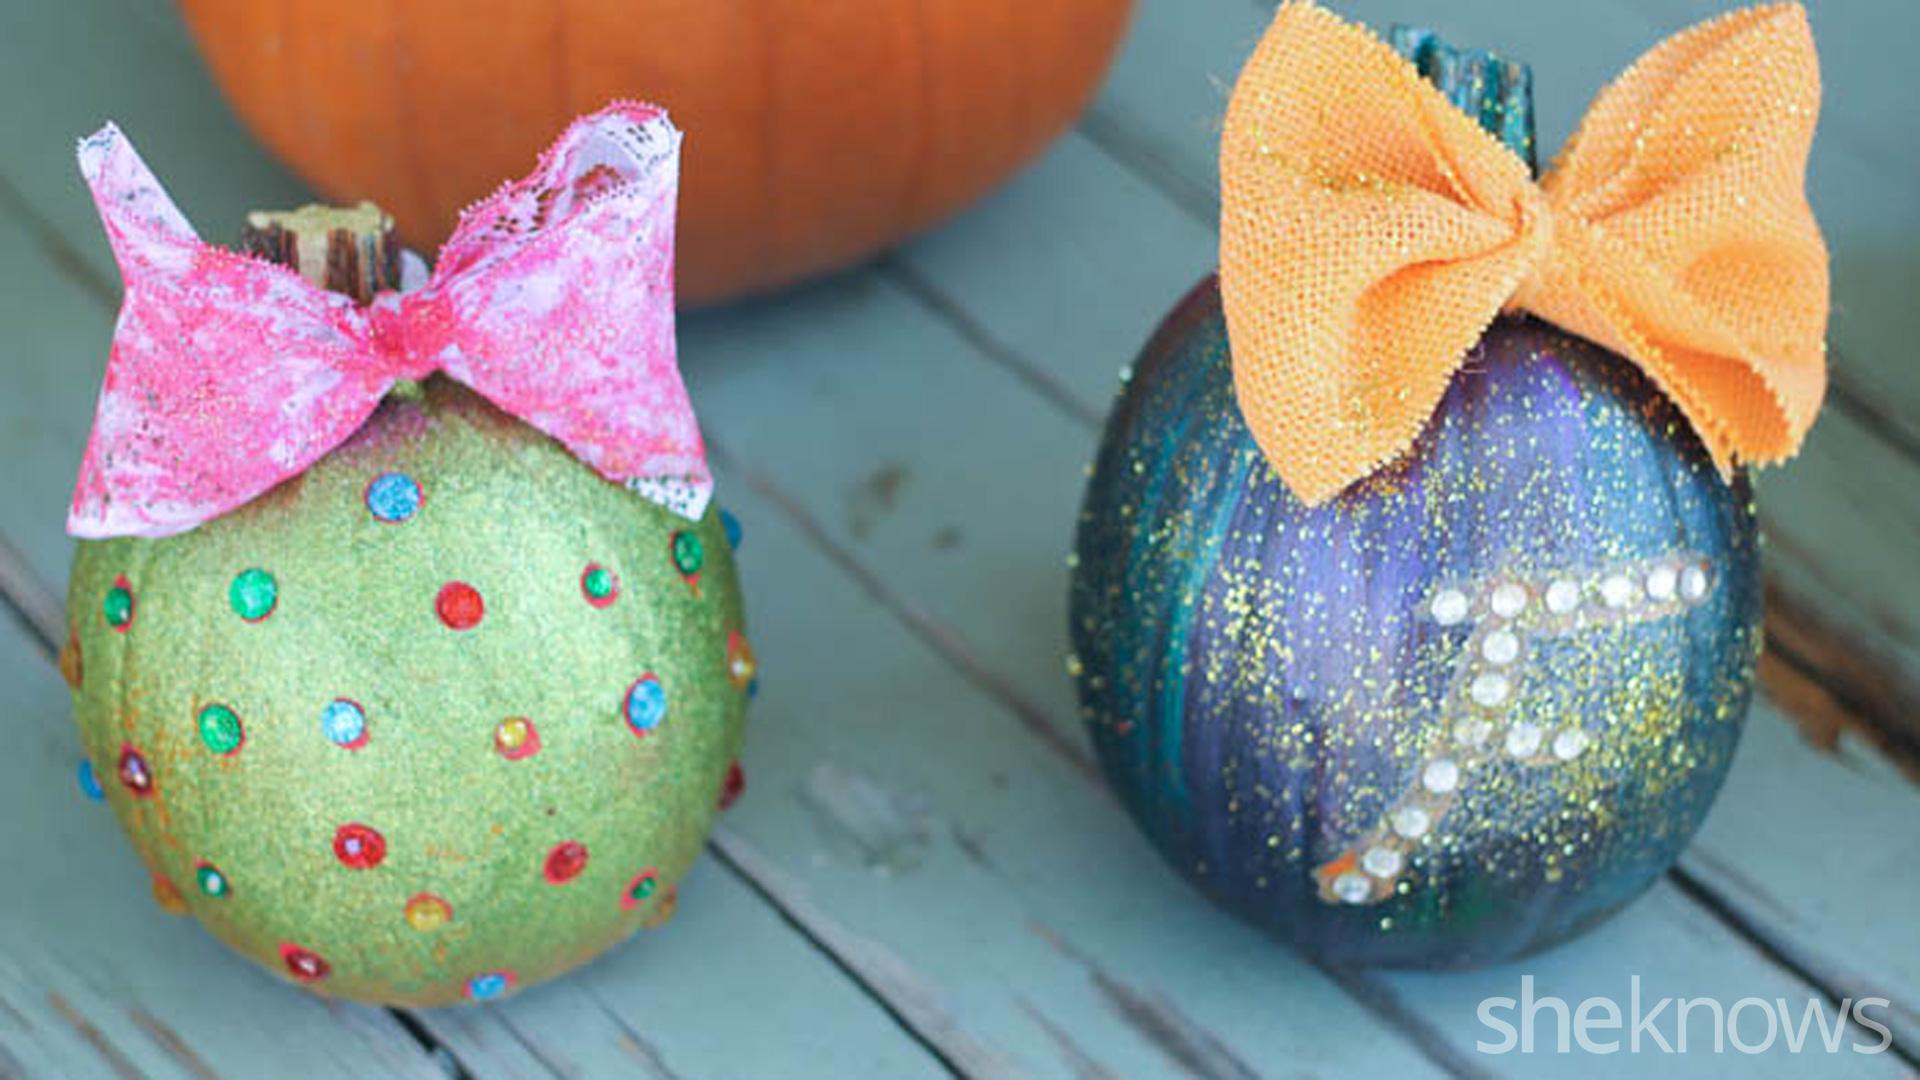 5 No Carve Pumpkin Decorating Ideas